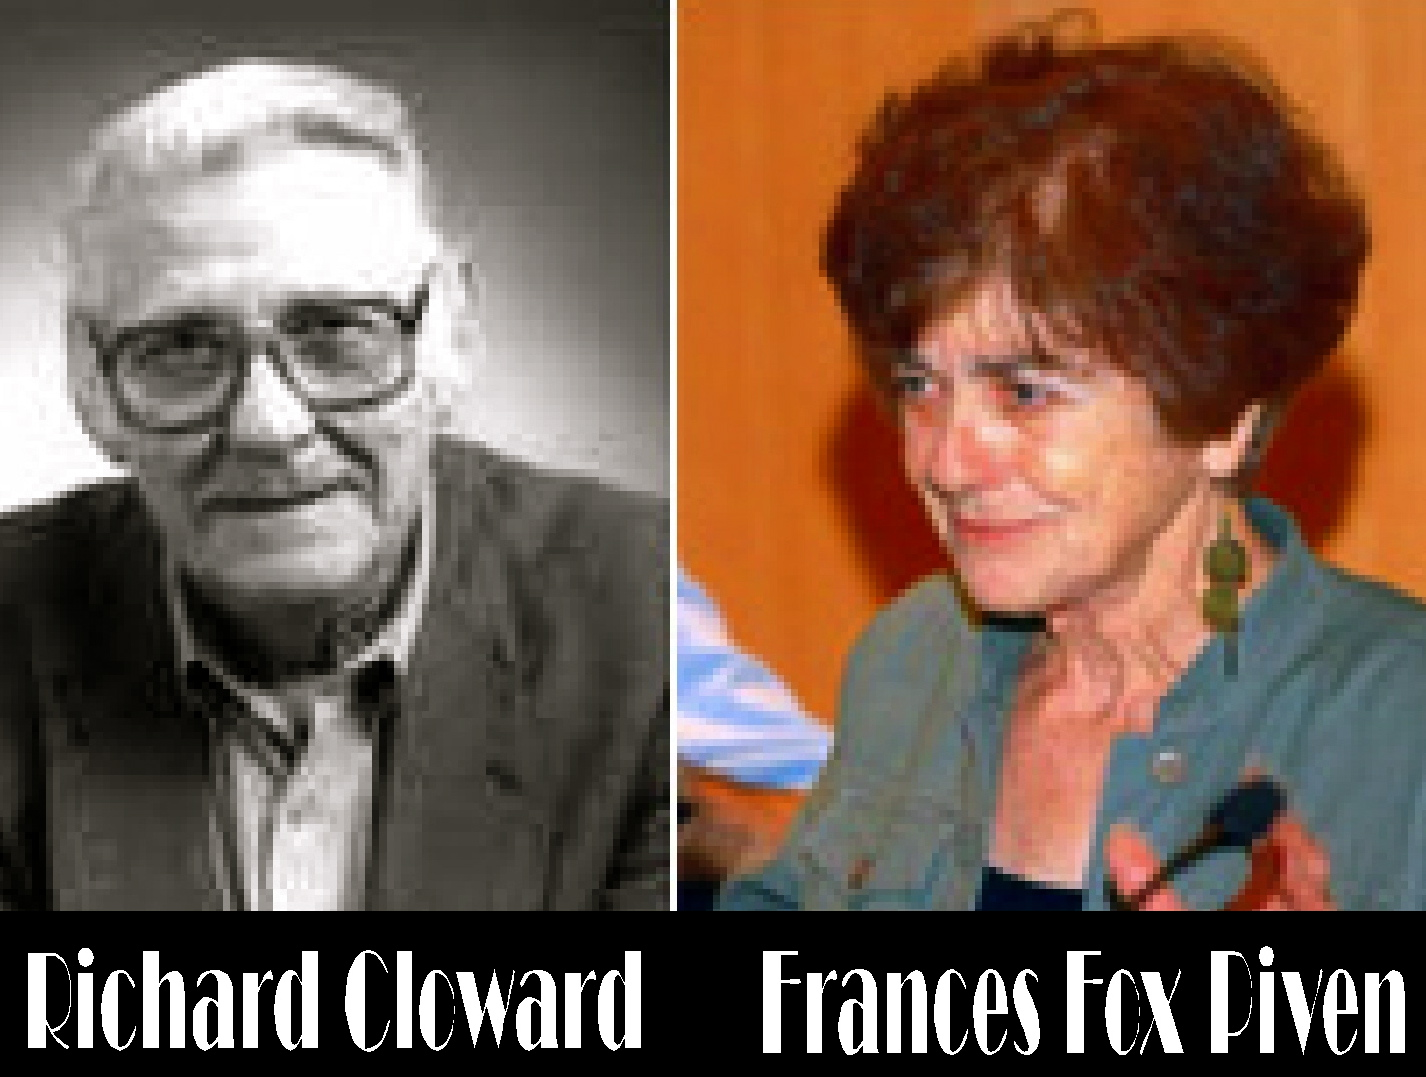 Strategy Piven Cloward Alinsky Saul